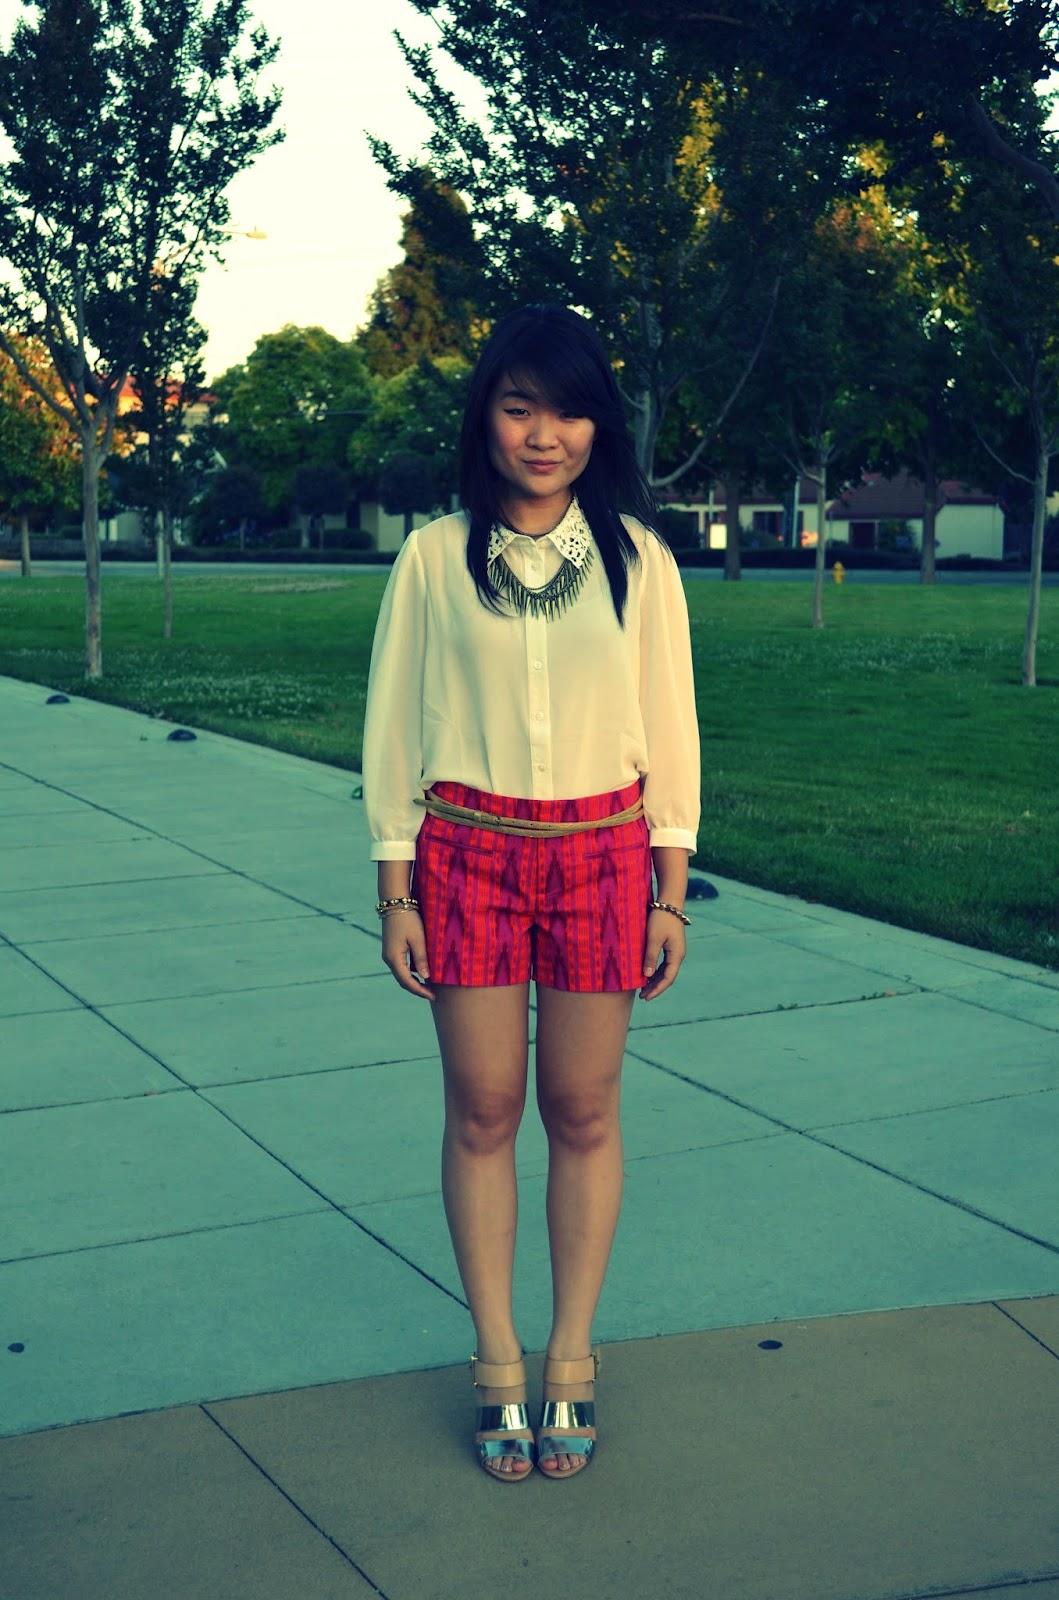 sam edelman yelena, forever 21, gap, lace collar, blouse, shorts, pink shorts, aztec print, aztec print shorts, aztec shorts